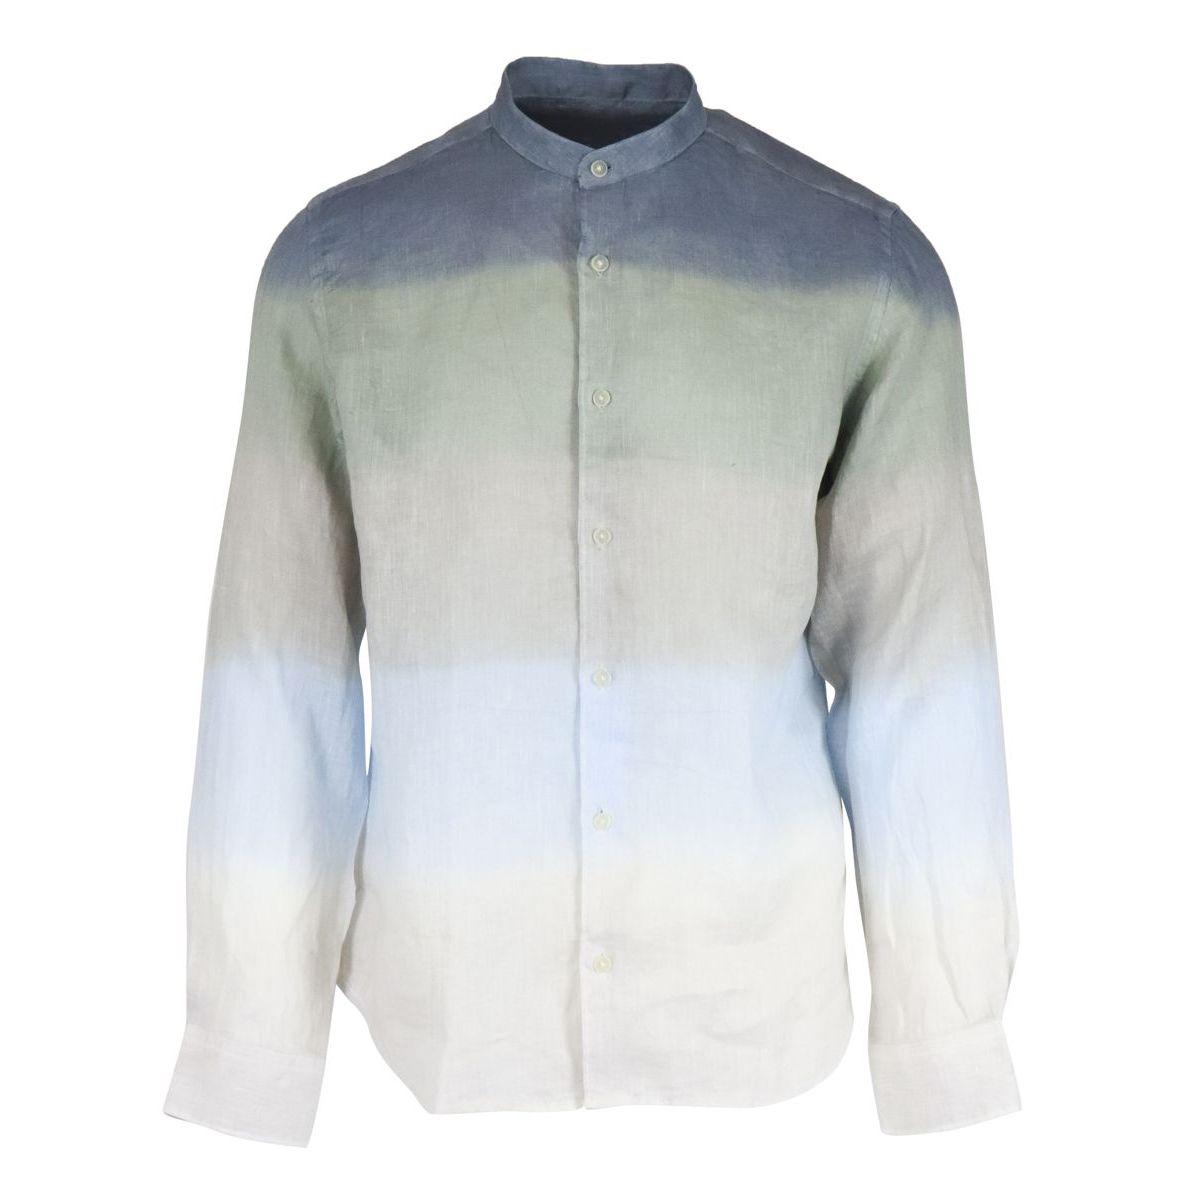 1. Altea linen shirt with guru collar with shaded stripes Blue Altea